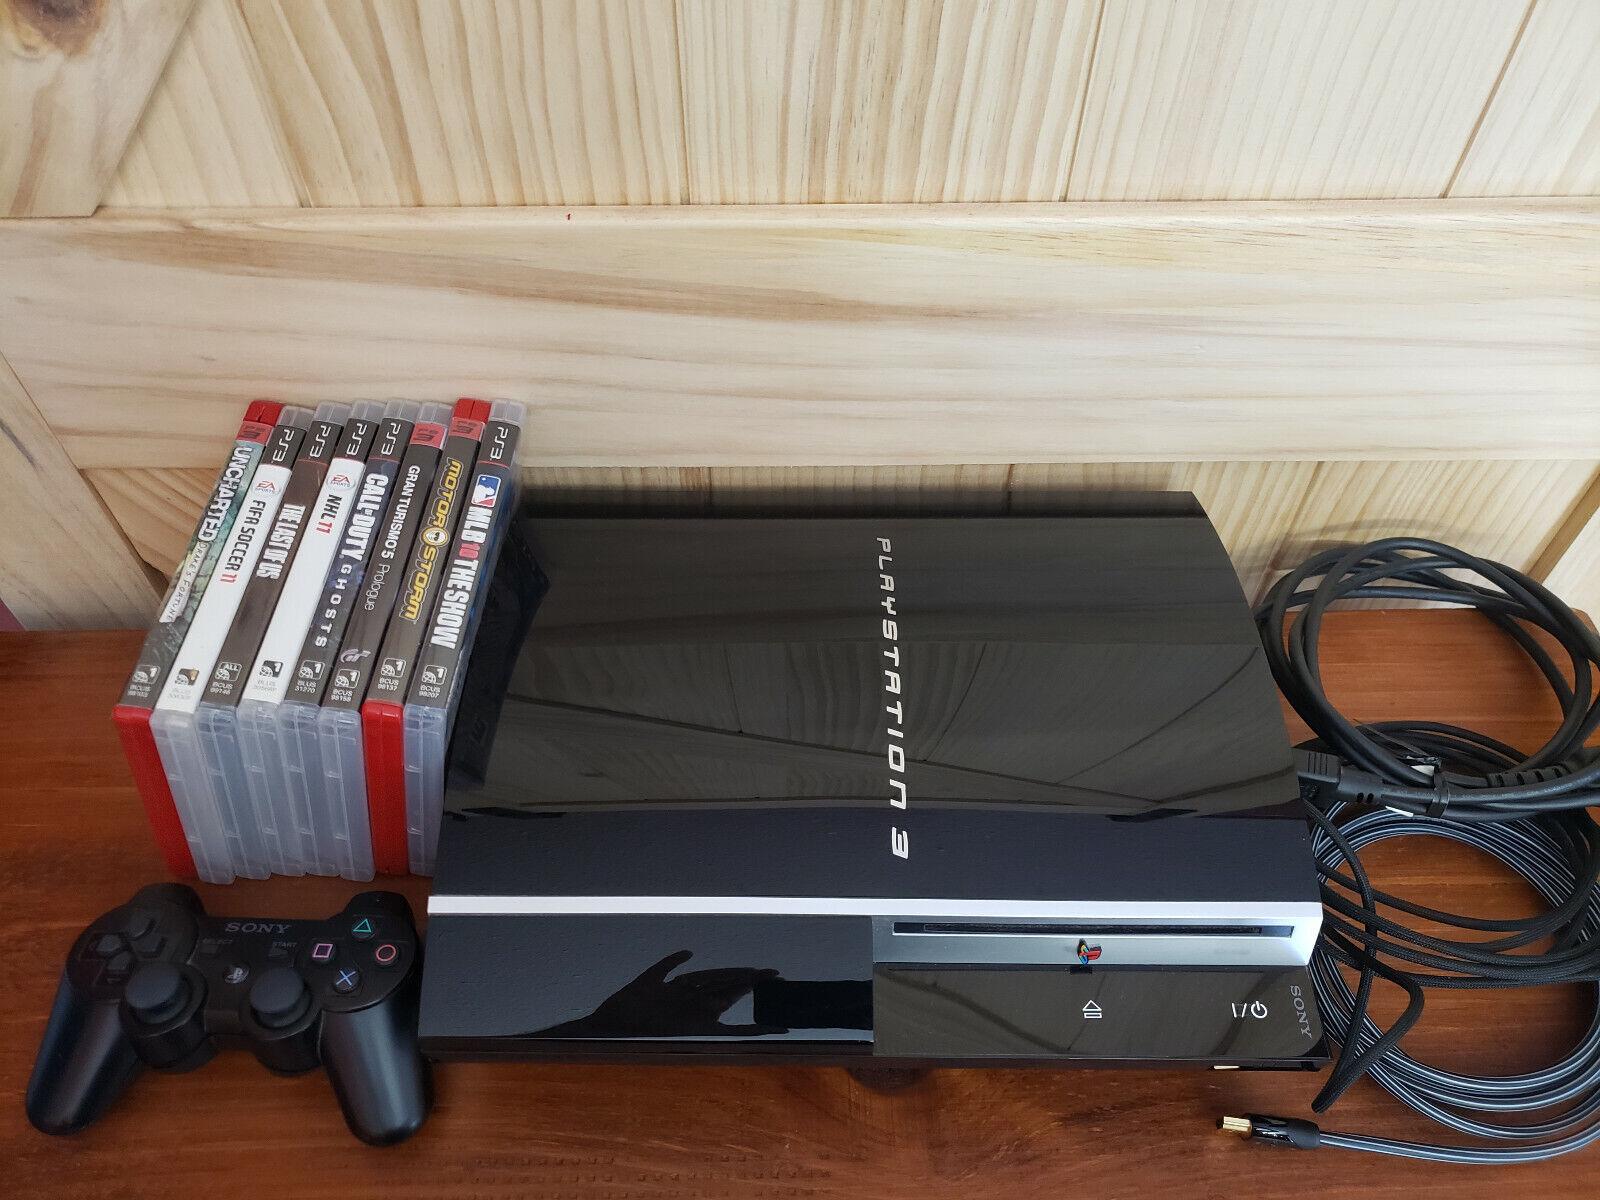 Sony Playstation 3 80GB System 2008 Model CECHK01 + 8 Game Bundle + 1 Controller